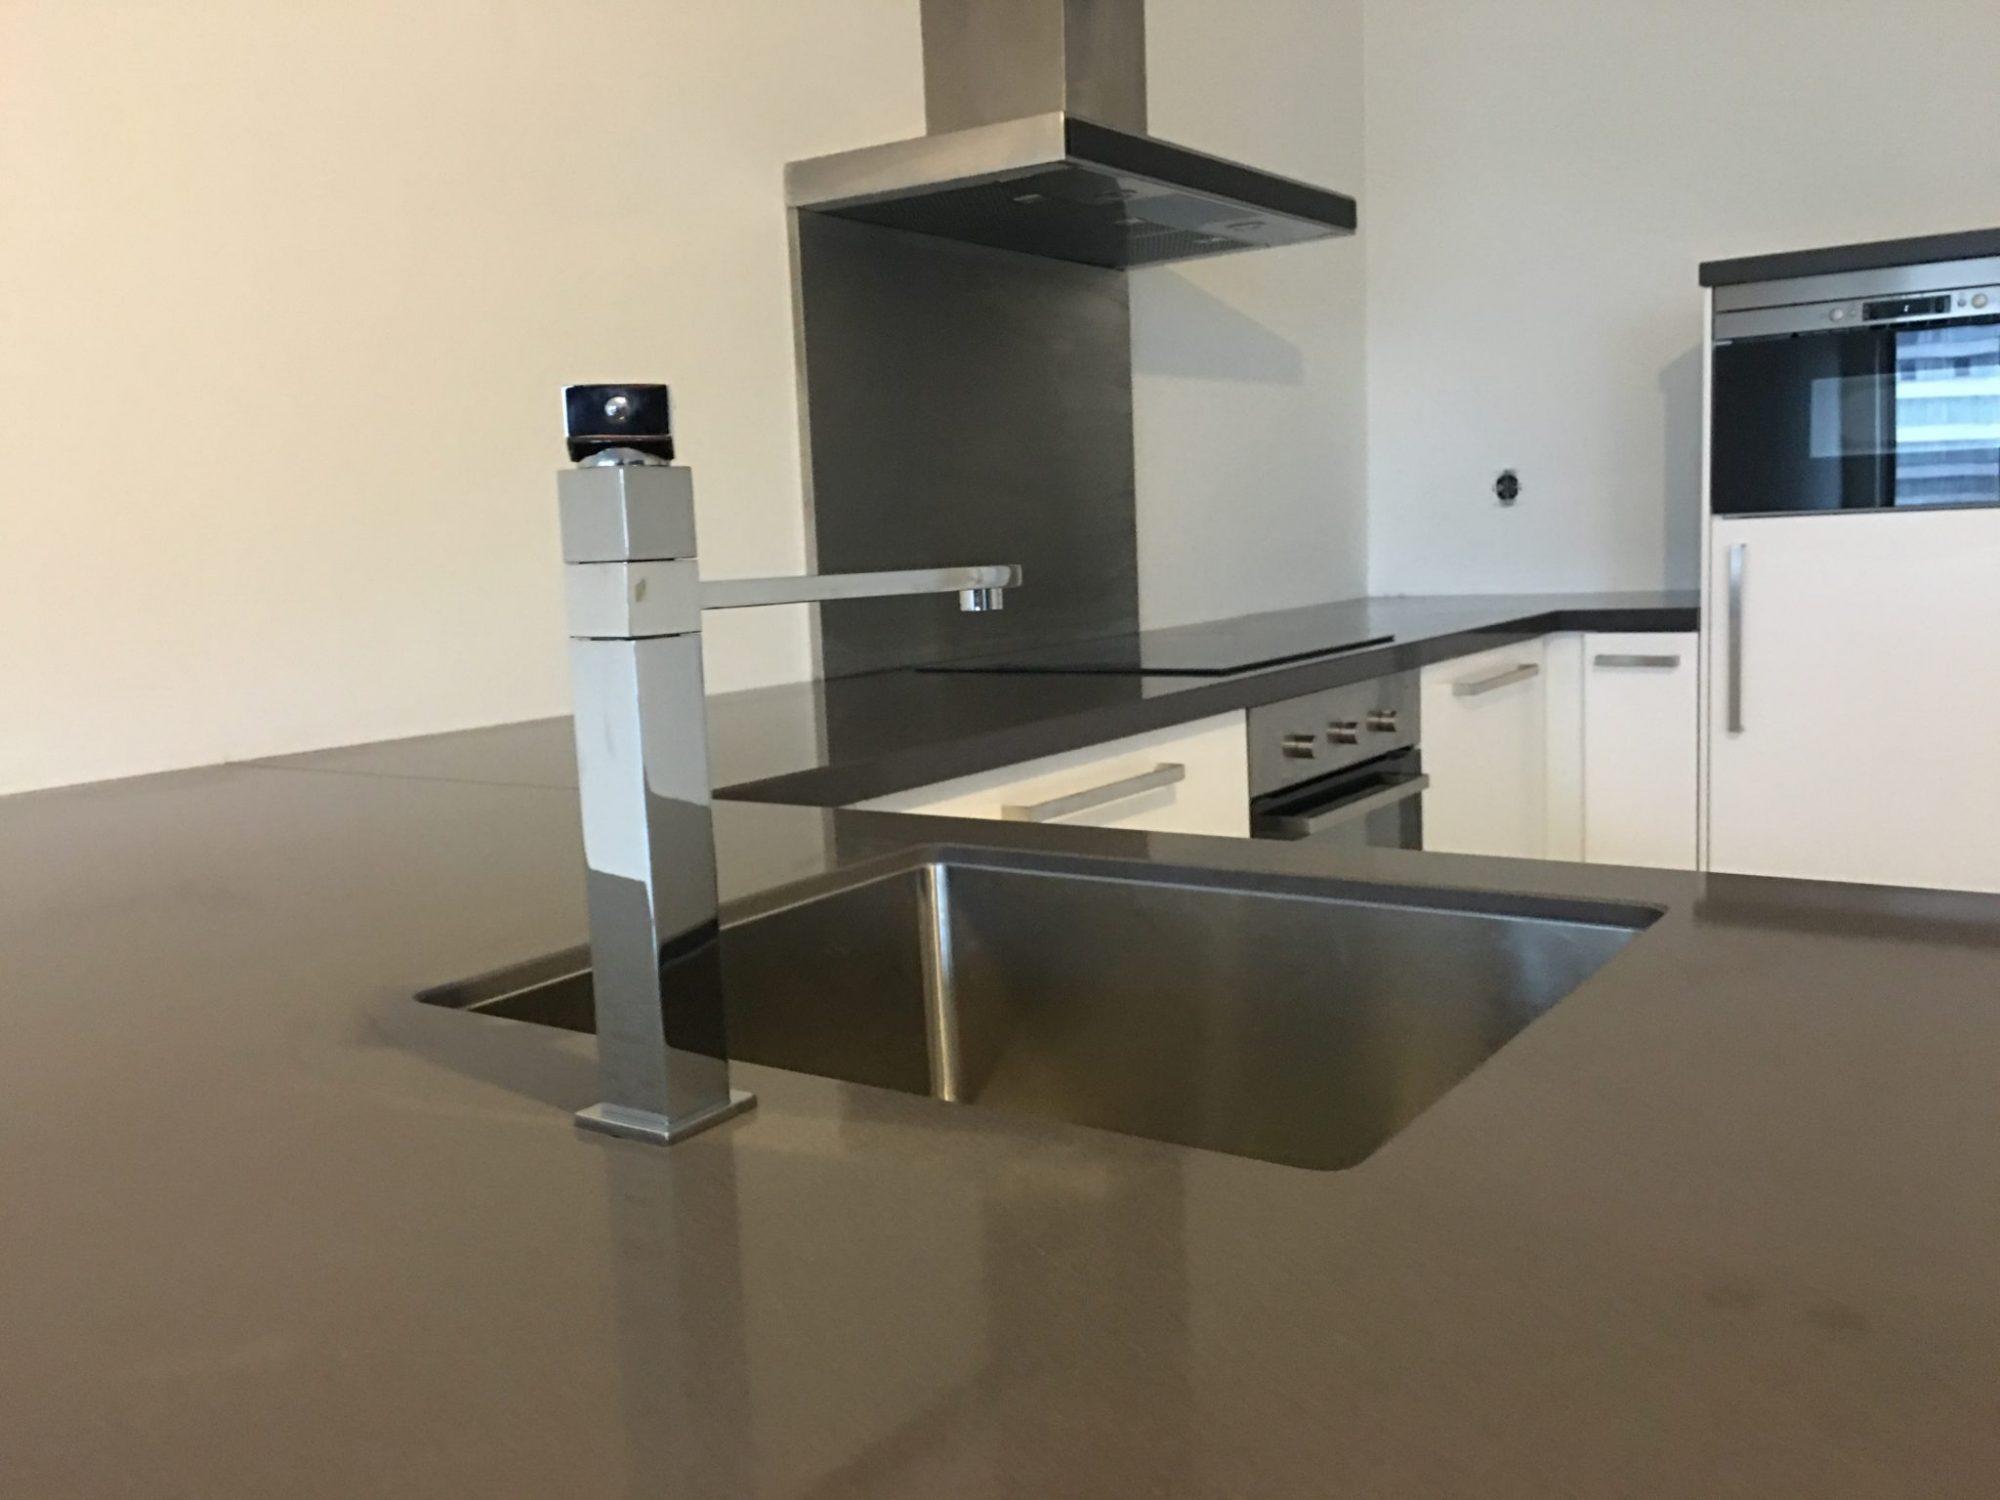 montage luxe ikea metod keuken rotterdam weena marco. Black Bedroom Furniture Sets. Home Design Ideas